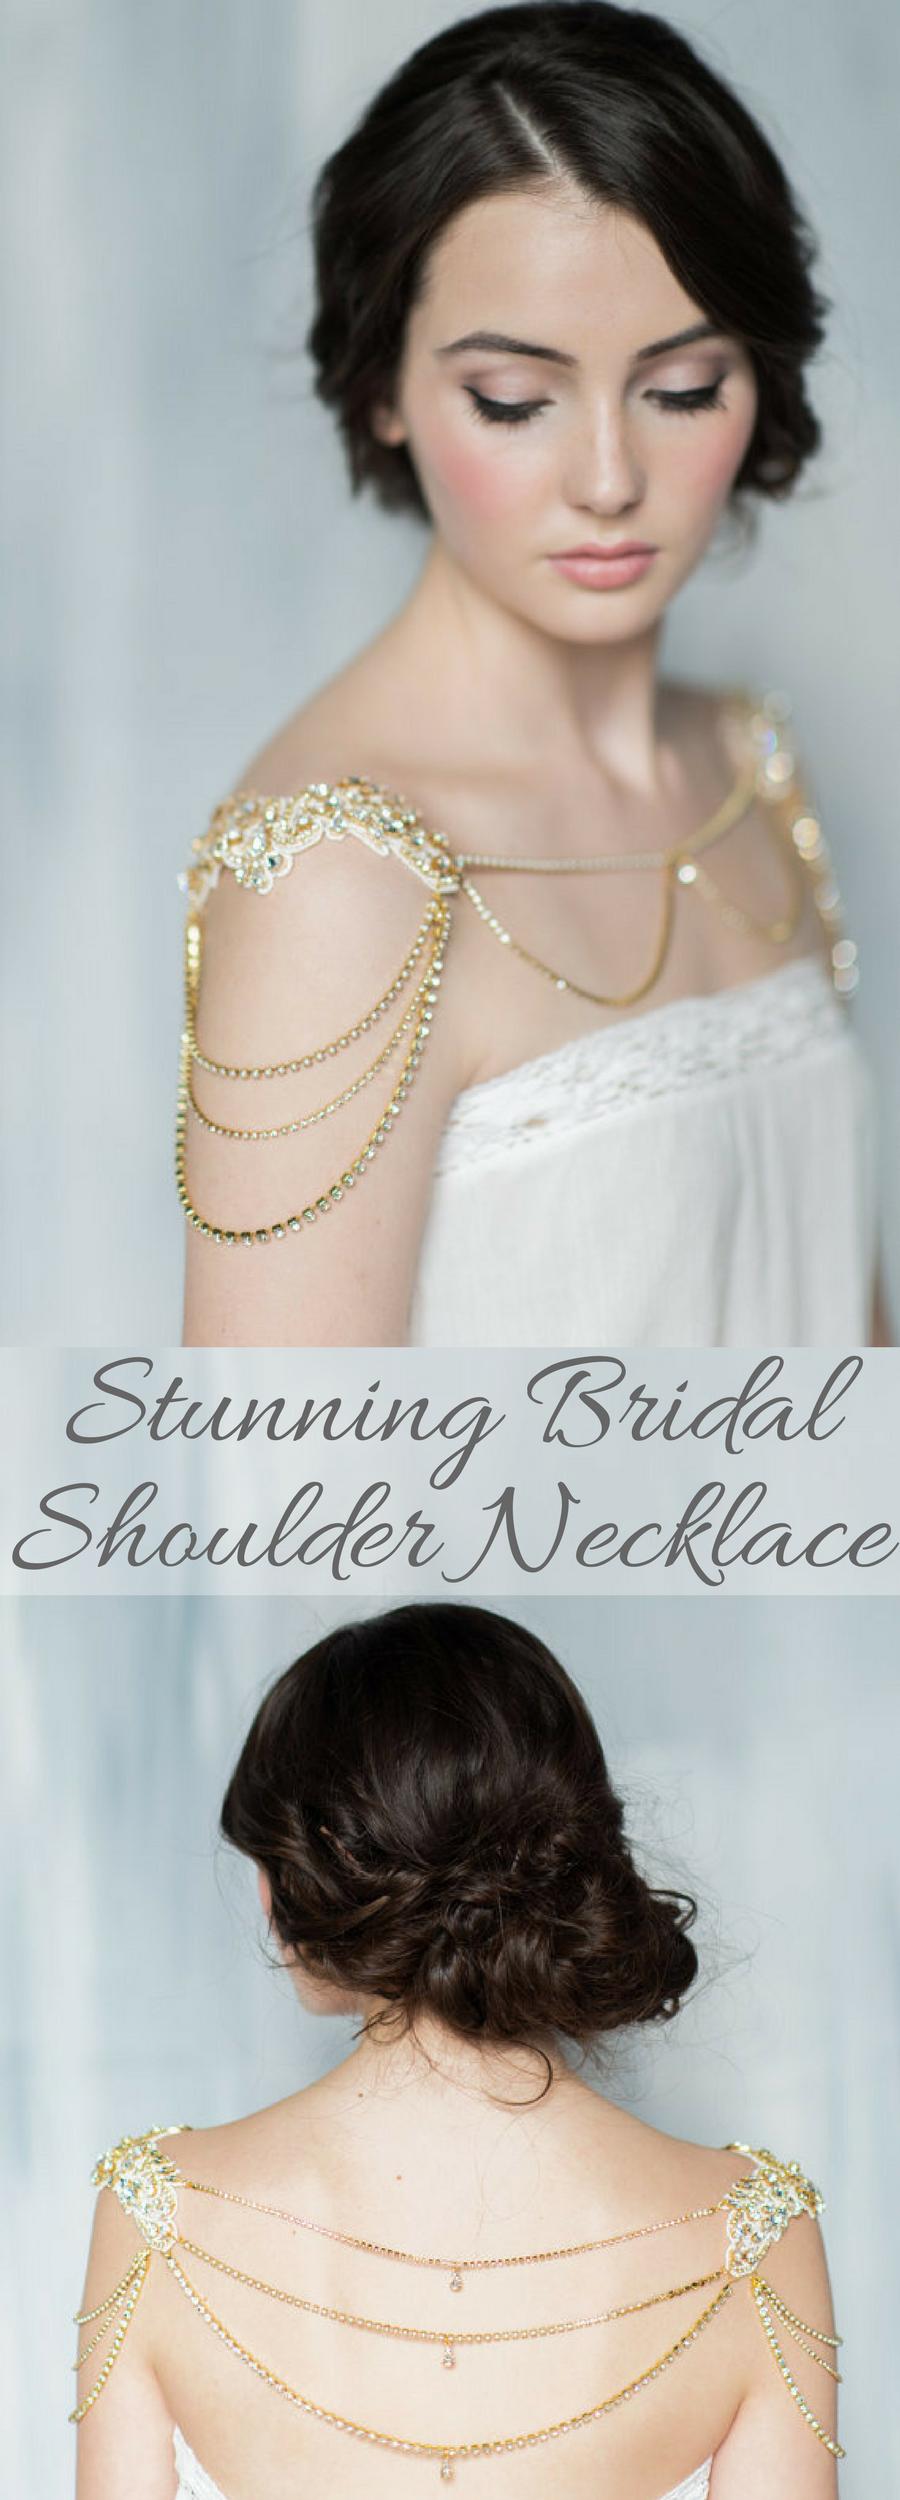 Absolutely stunning bridal shoulder necklace wedding ideas